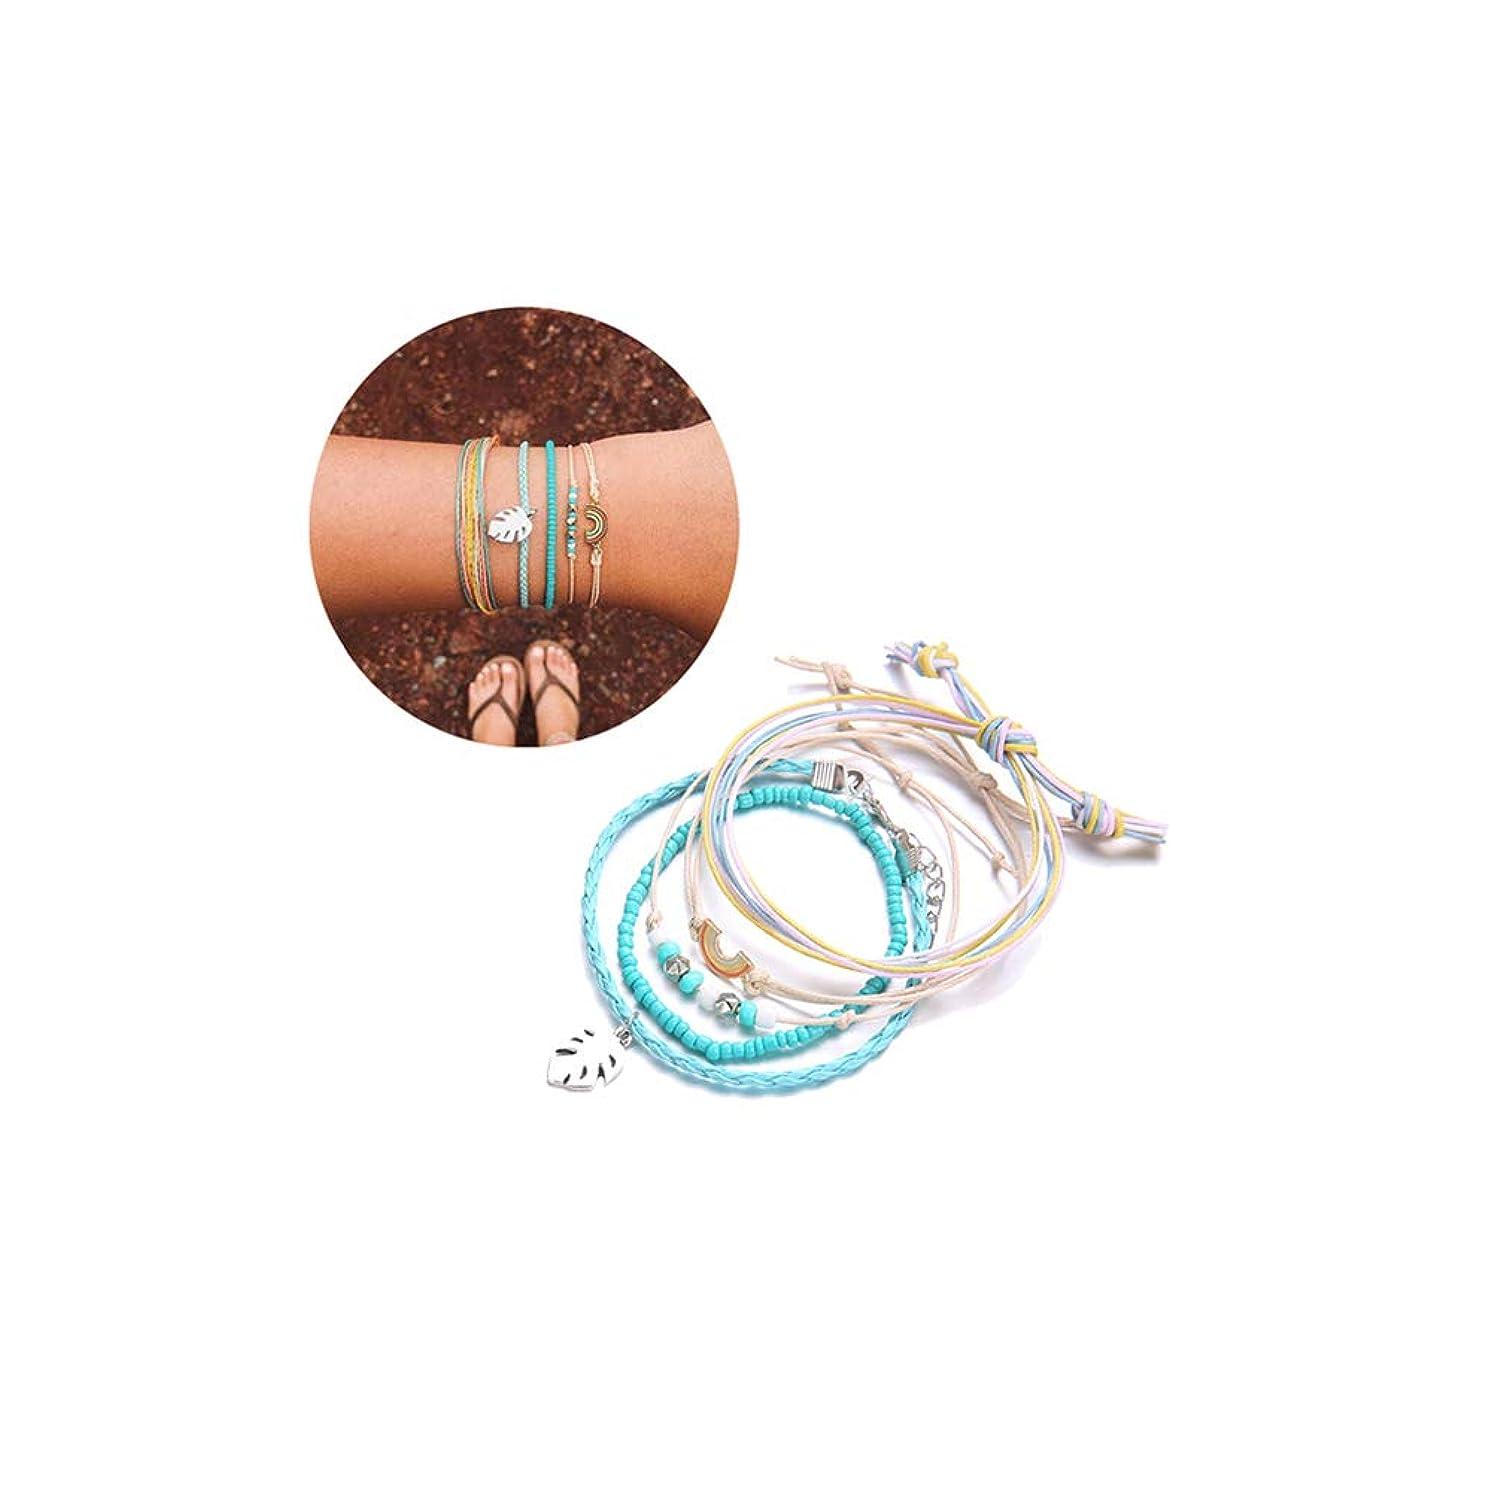 ASHMITA Summer Wave Strand Bracelet Girls Bohemian Bracelet Adjustable Handmade Waterproof Wax Coated Braided Rope Set